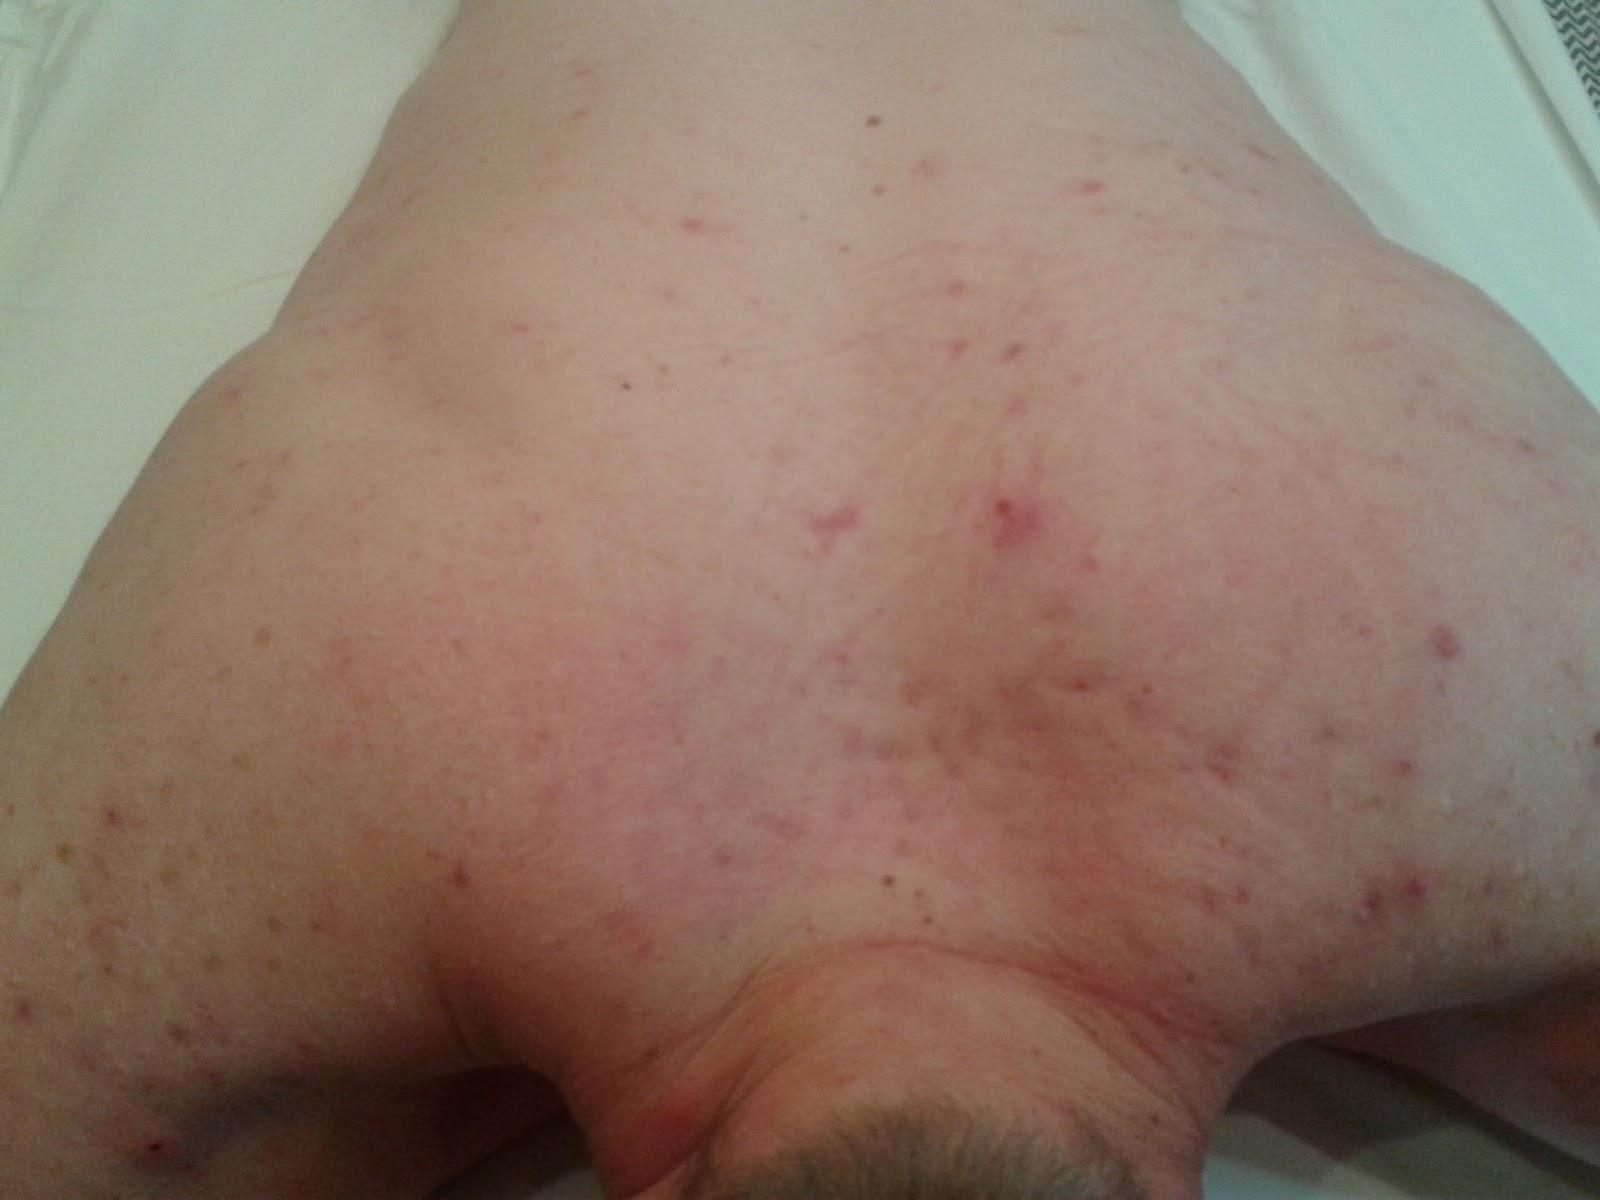 body acne treatments in salt lake city, utah